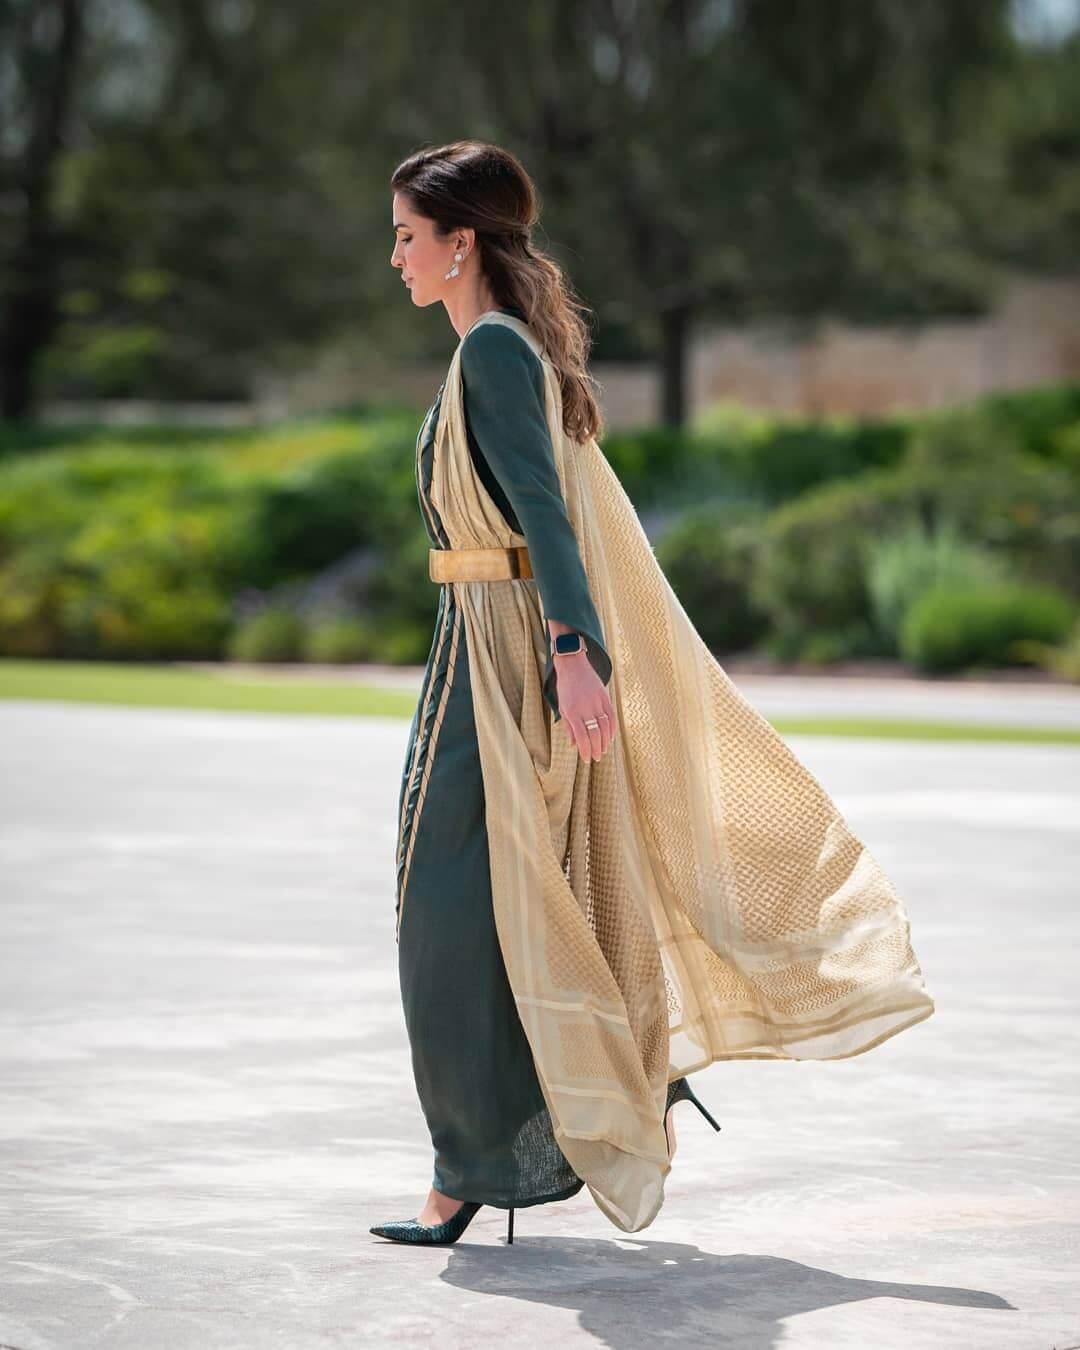 Queen Rania feet high heels